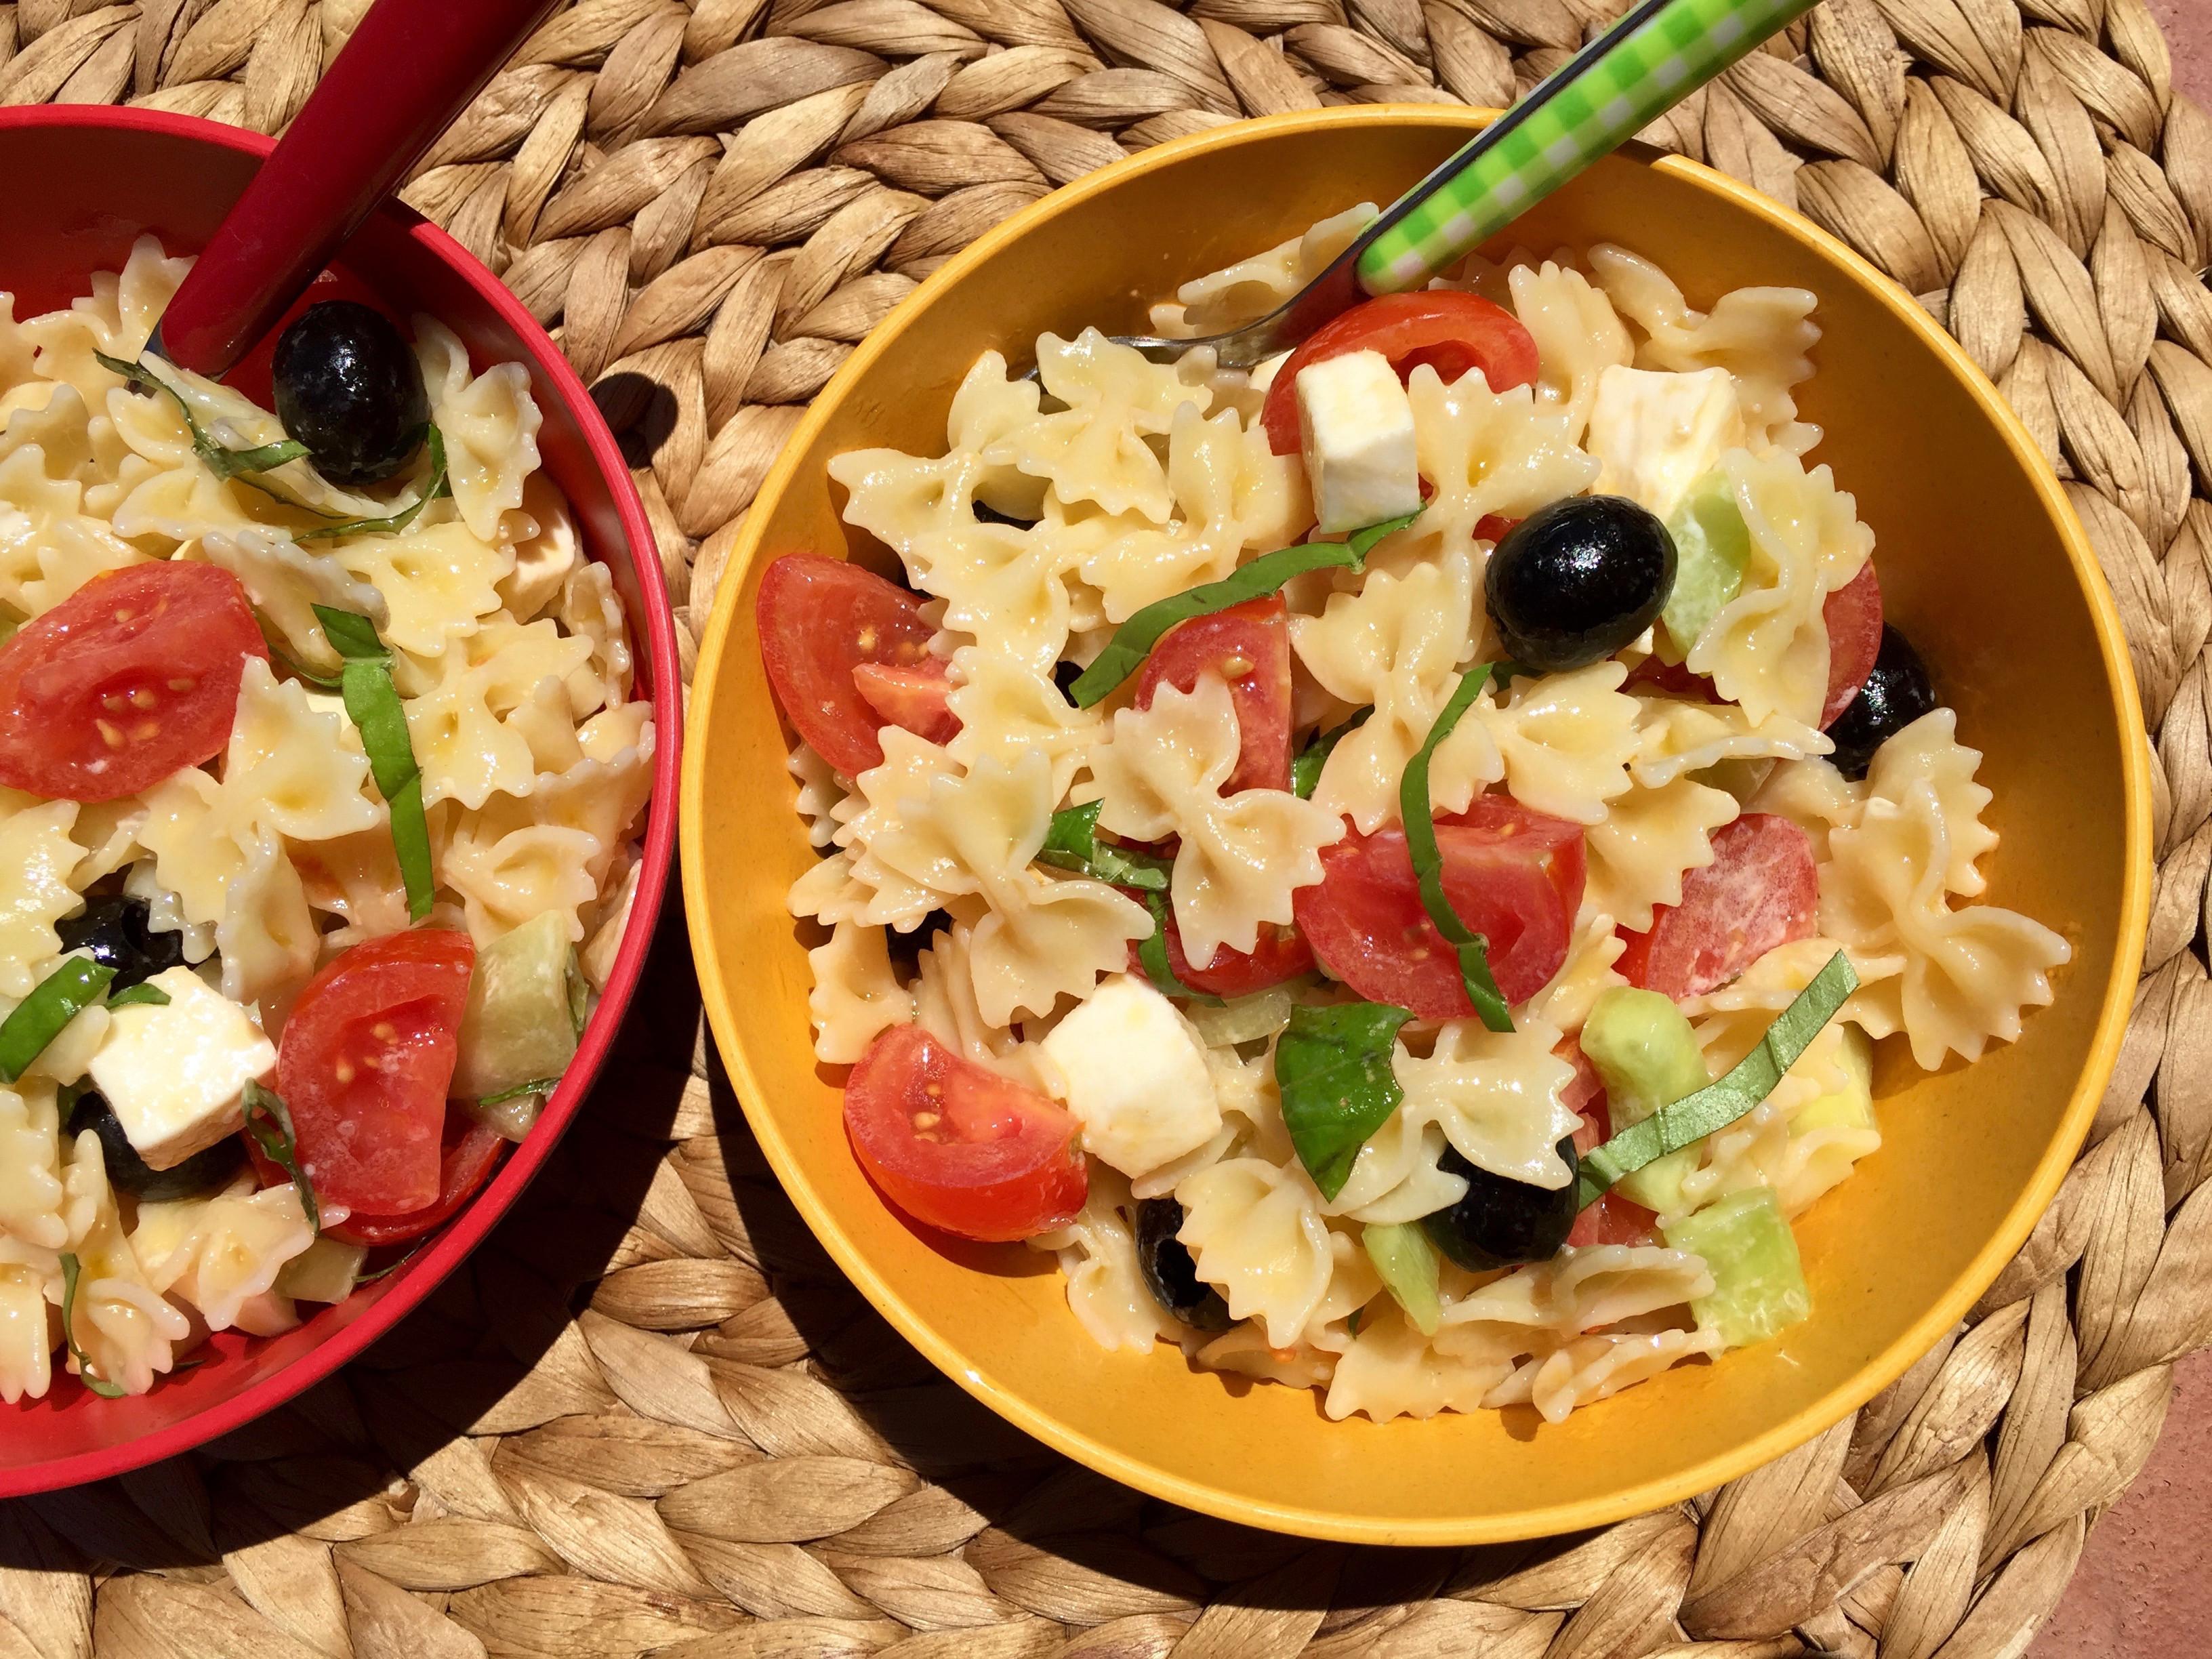 Summer Pasta Salad  Healthy Summer Pasta Salad Bites for Foo s